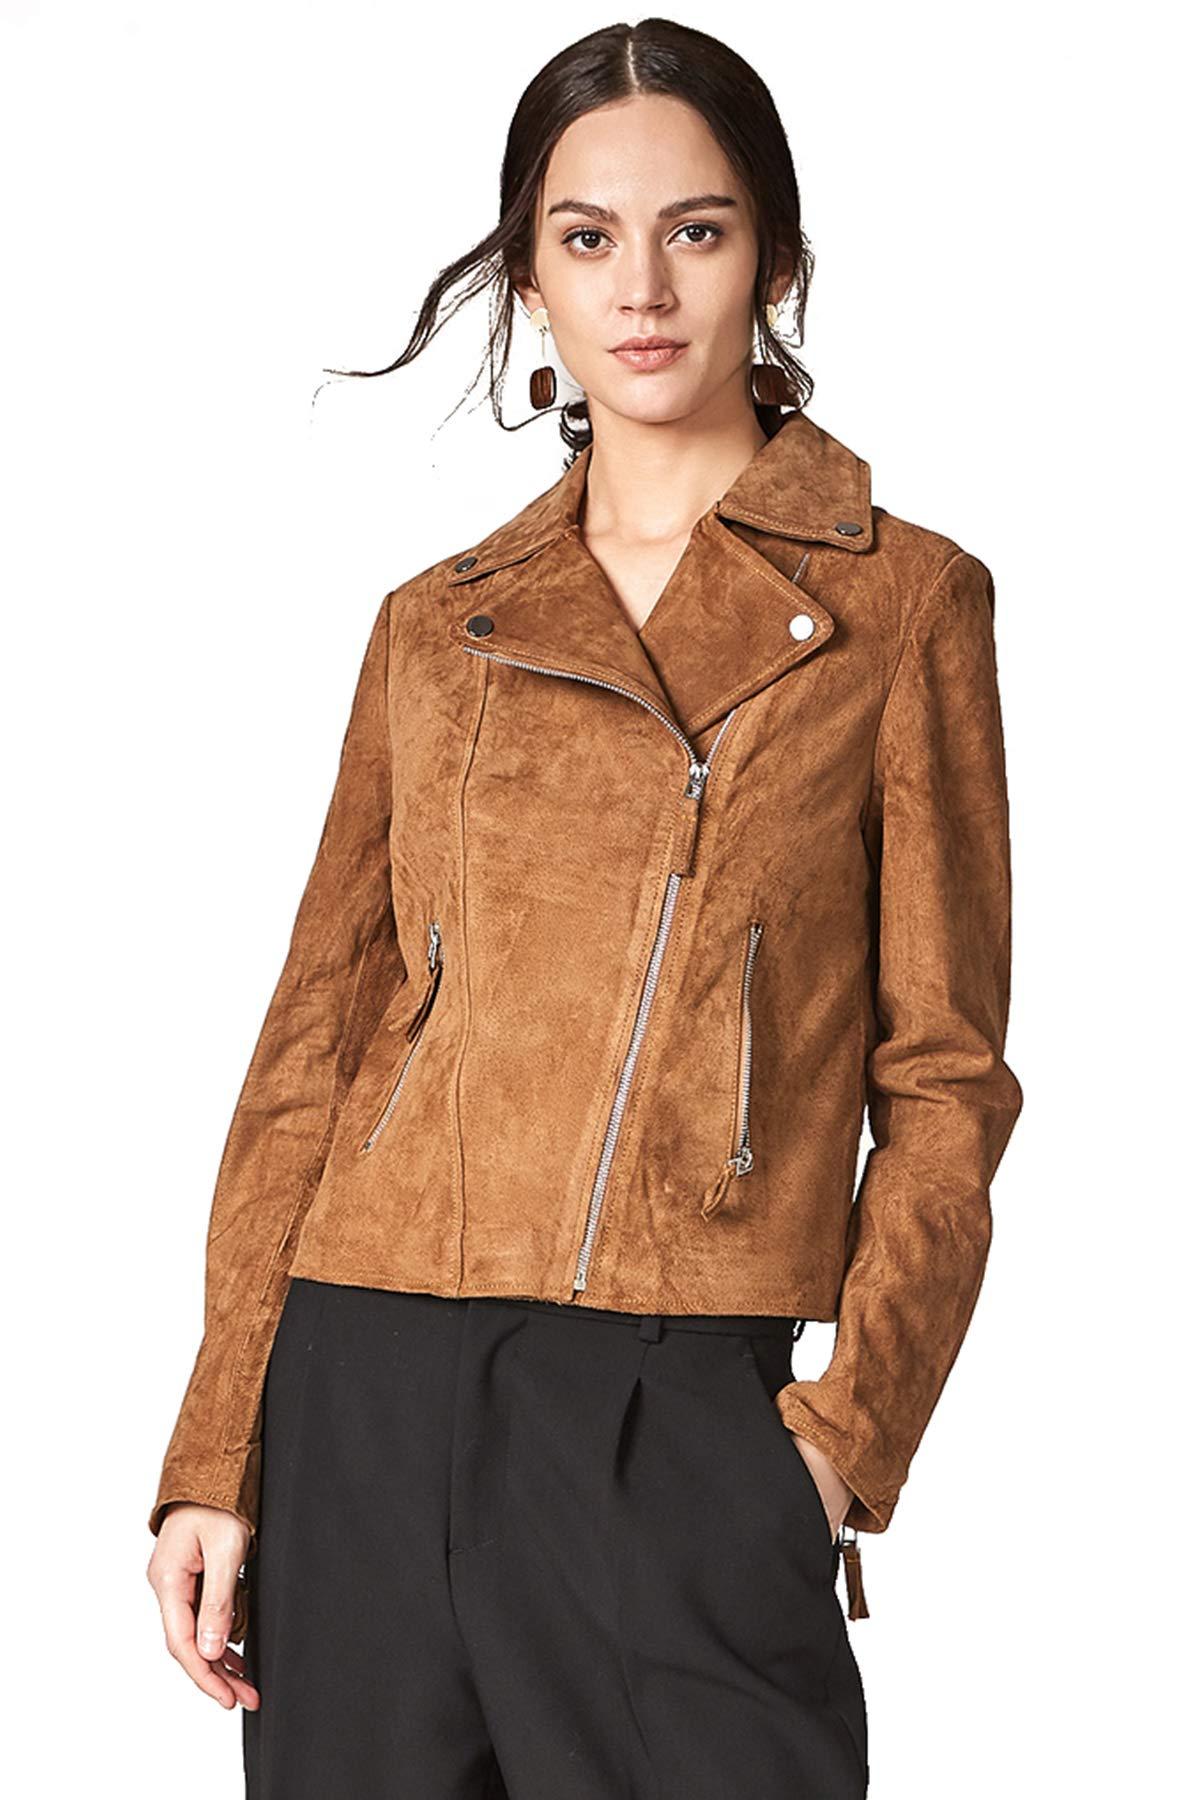 Escalier Women`s Genuine Leather Jacket Moto Biker Coat